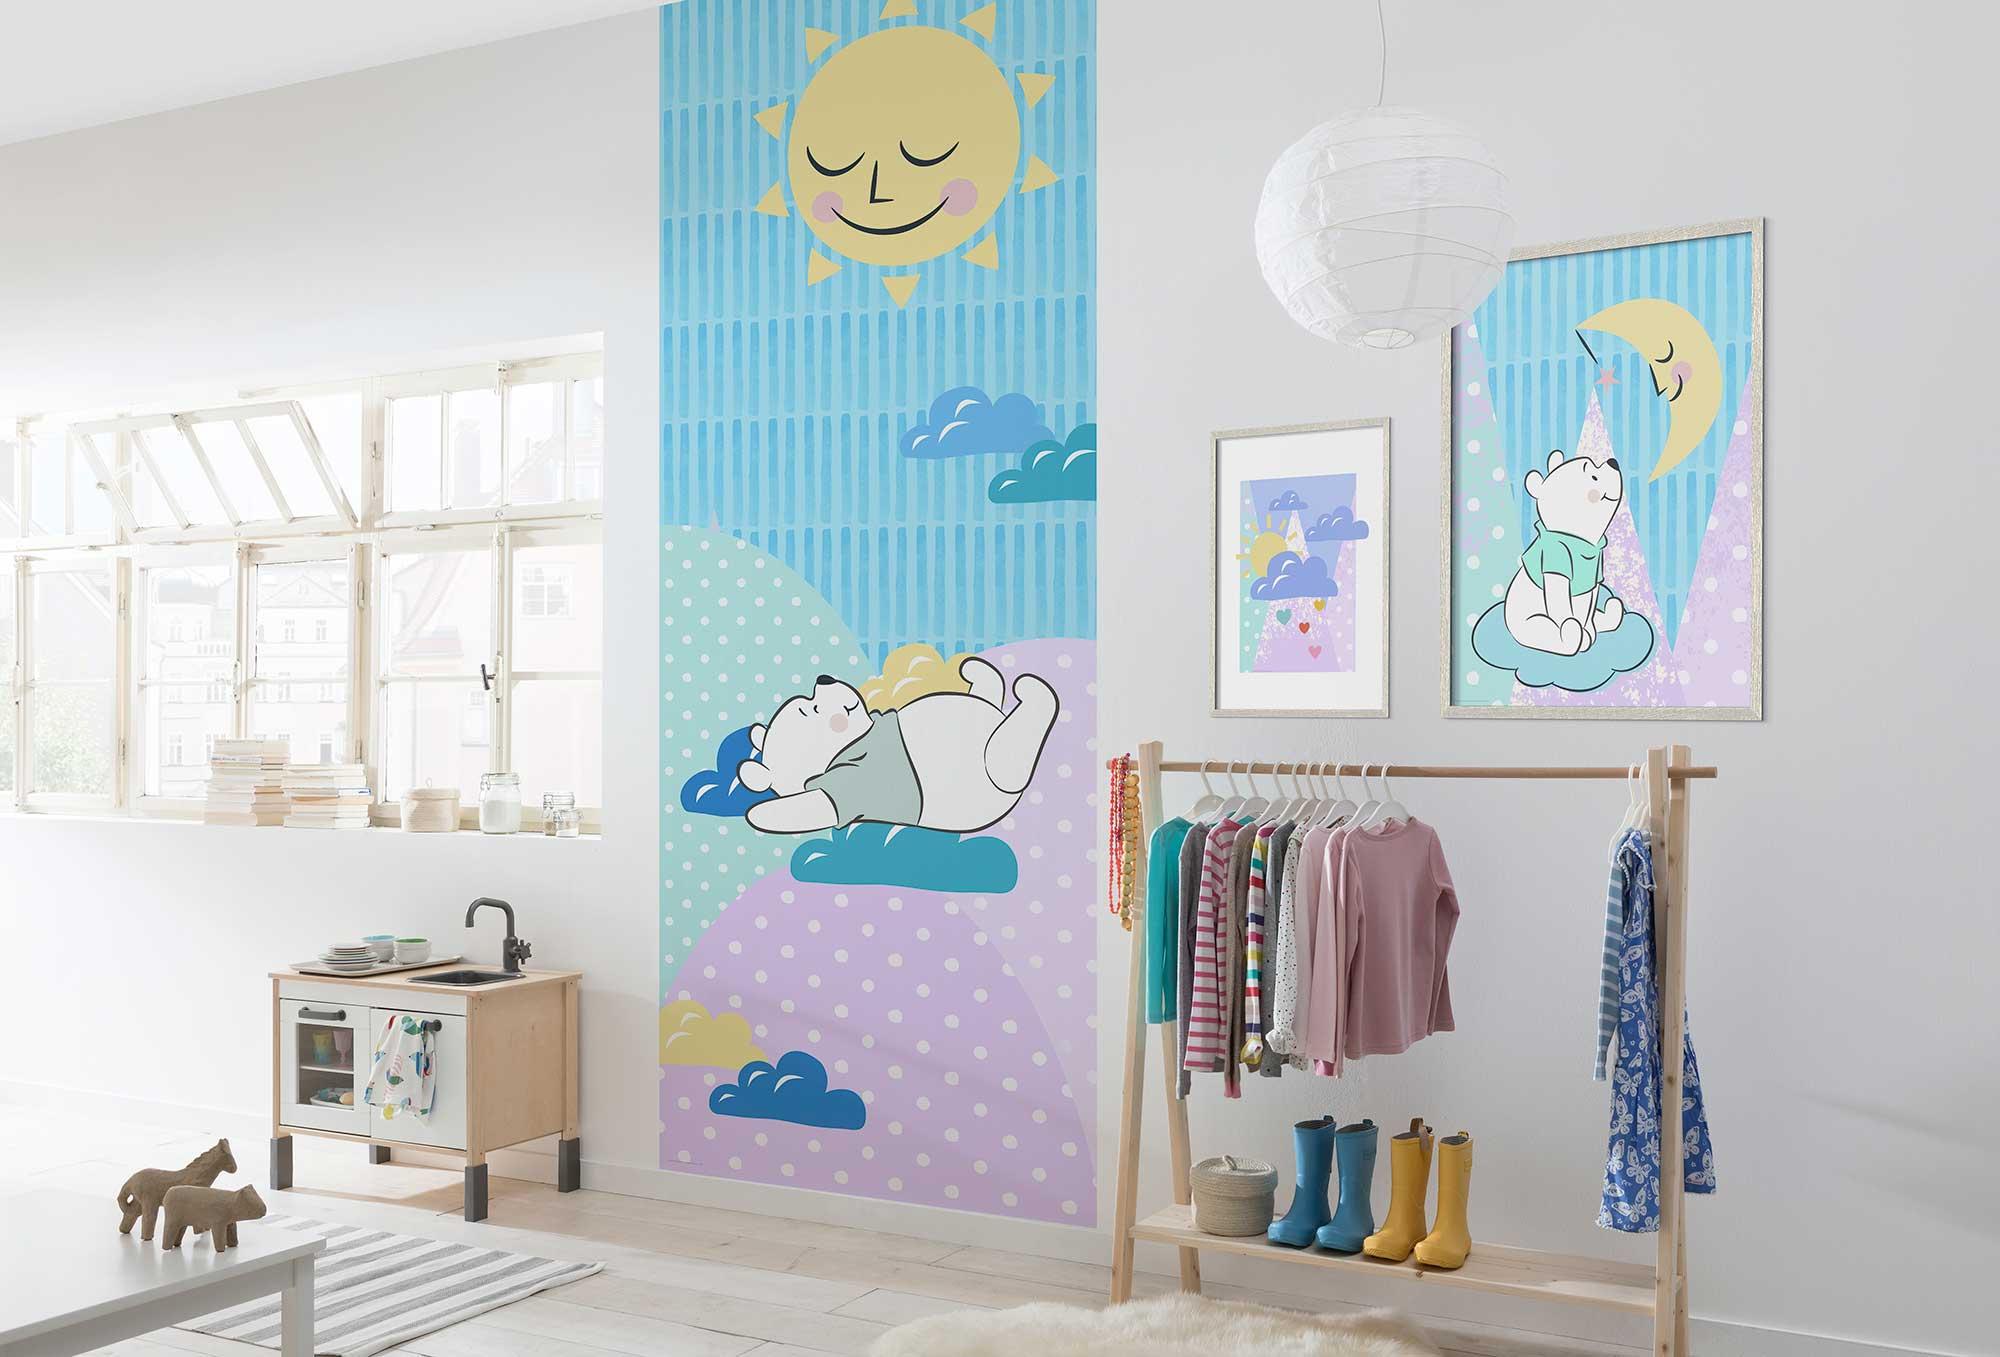 Disney Edition 4 Kinderbehang Komar - Kinderkamer behang Winnie Pooh Take a Nap